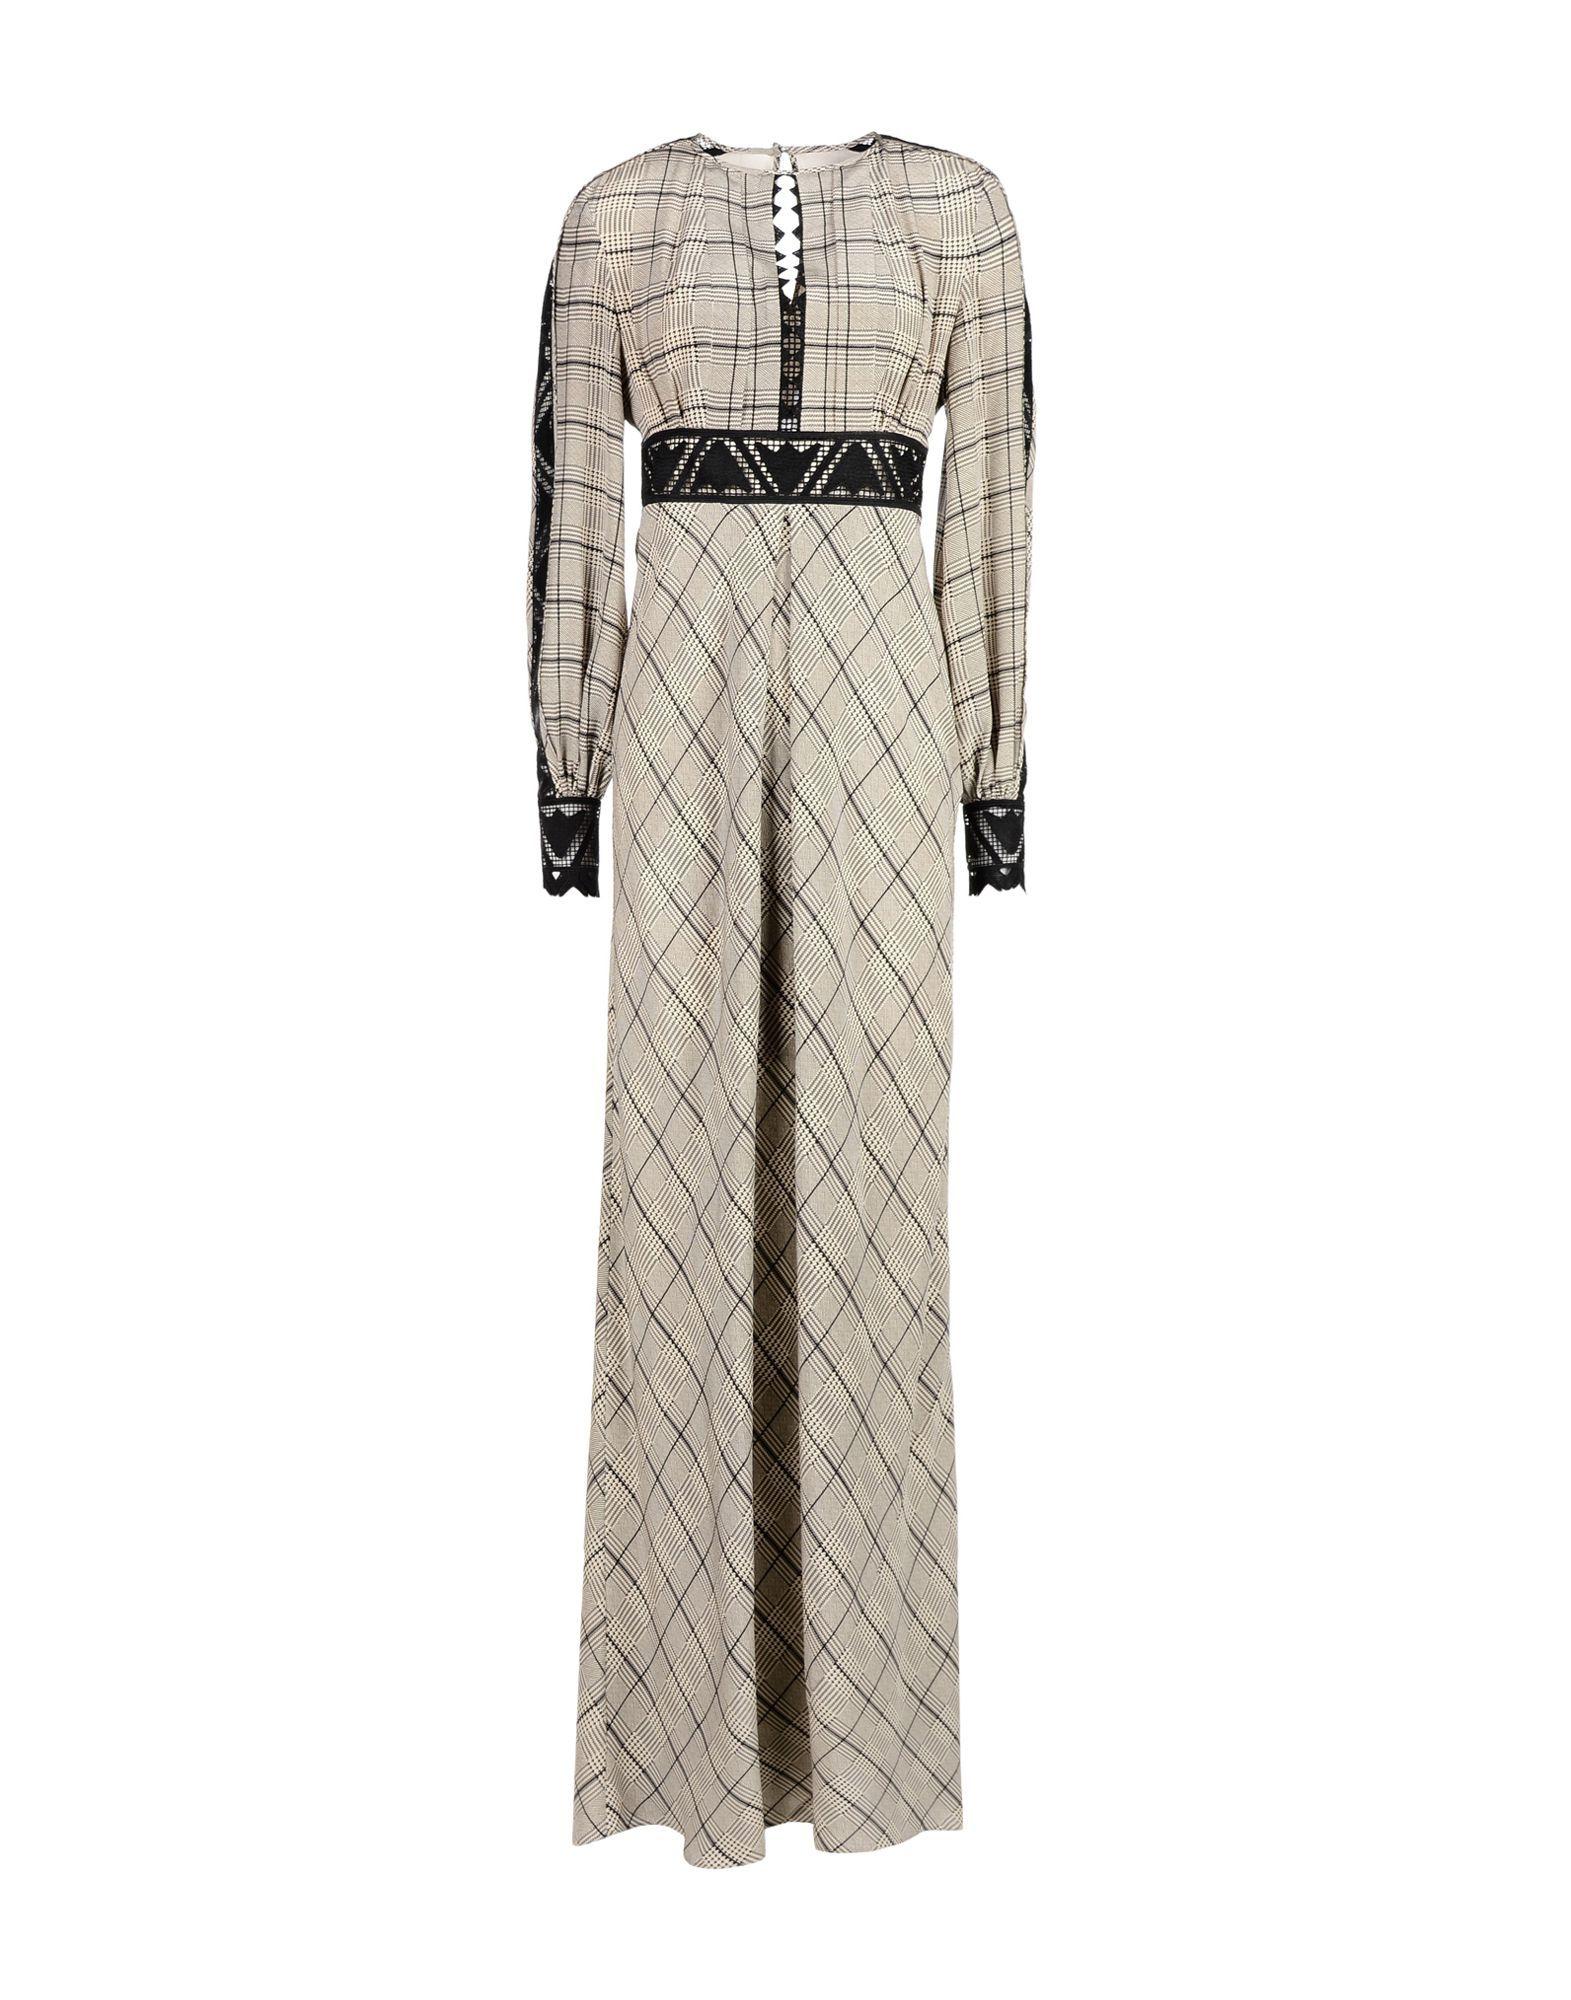 Temperley London Black Silk And Lace Full Length Dress